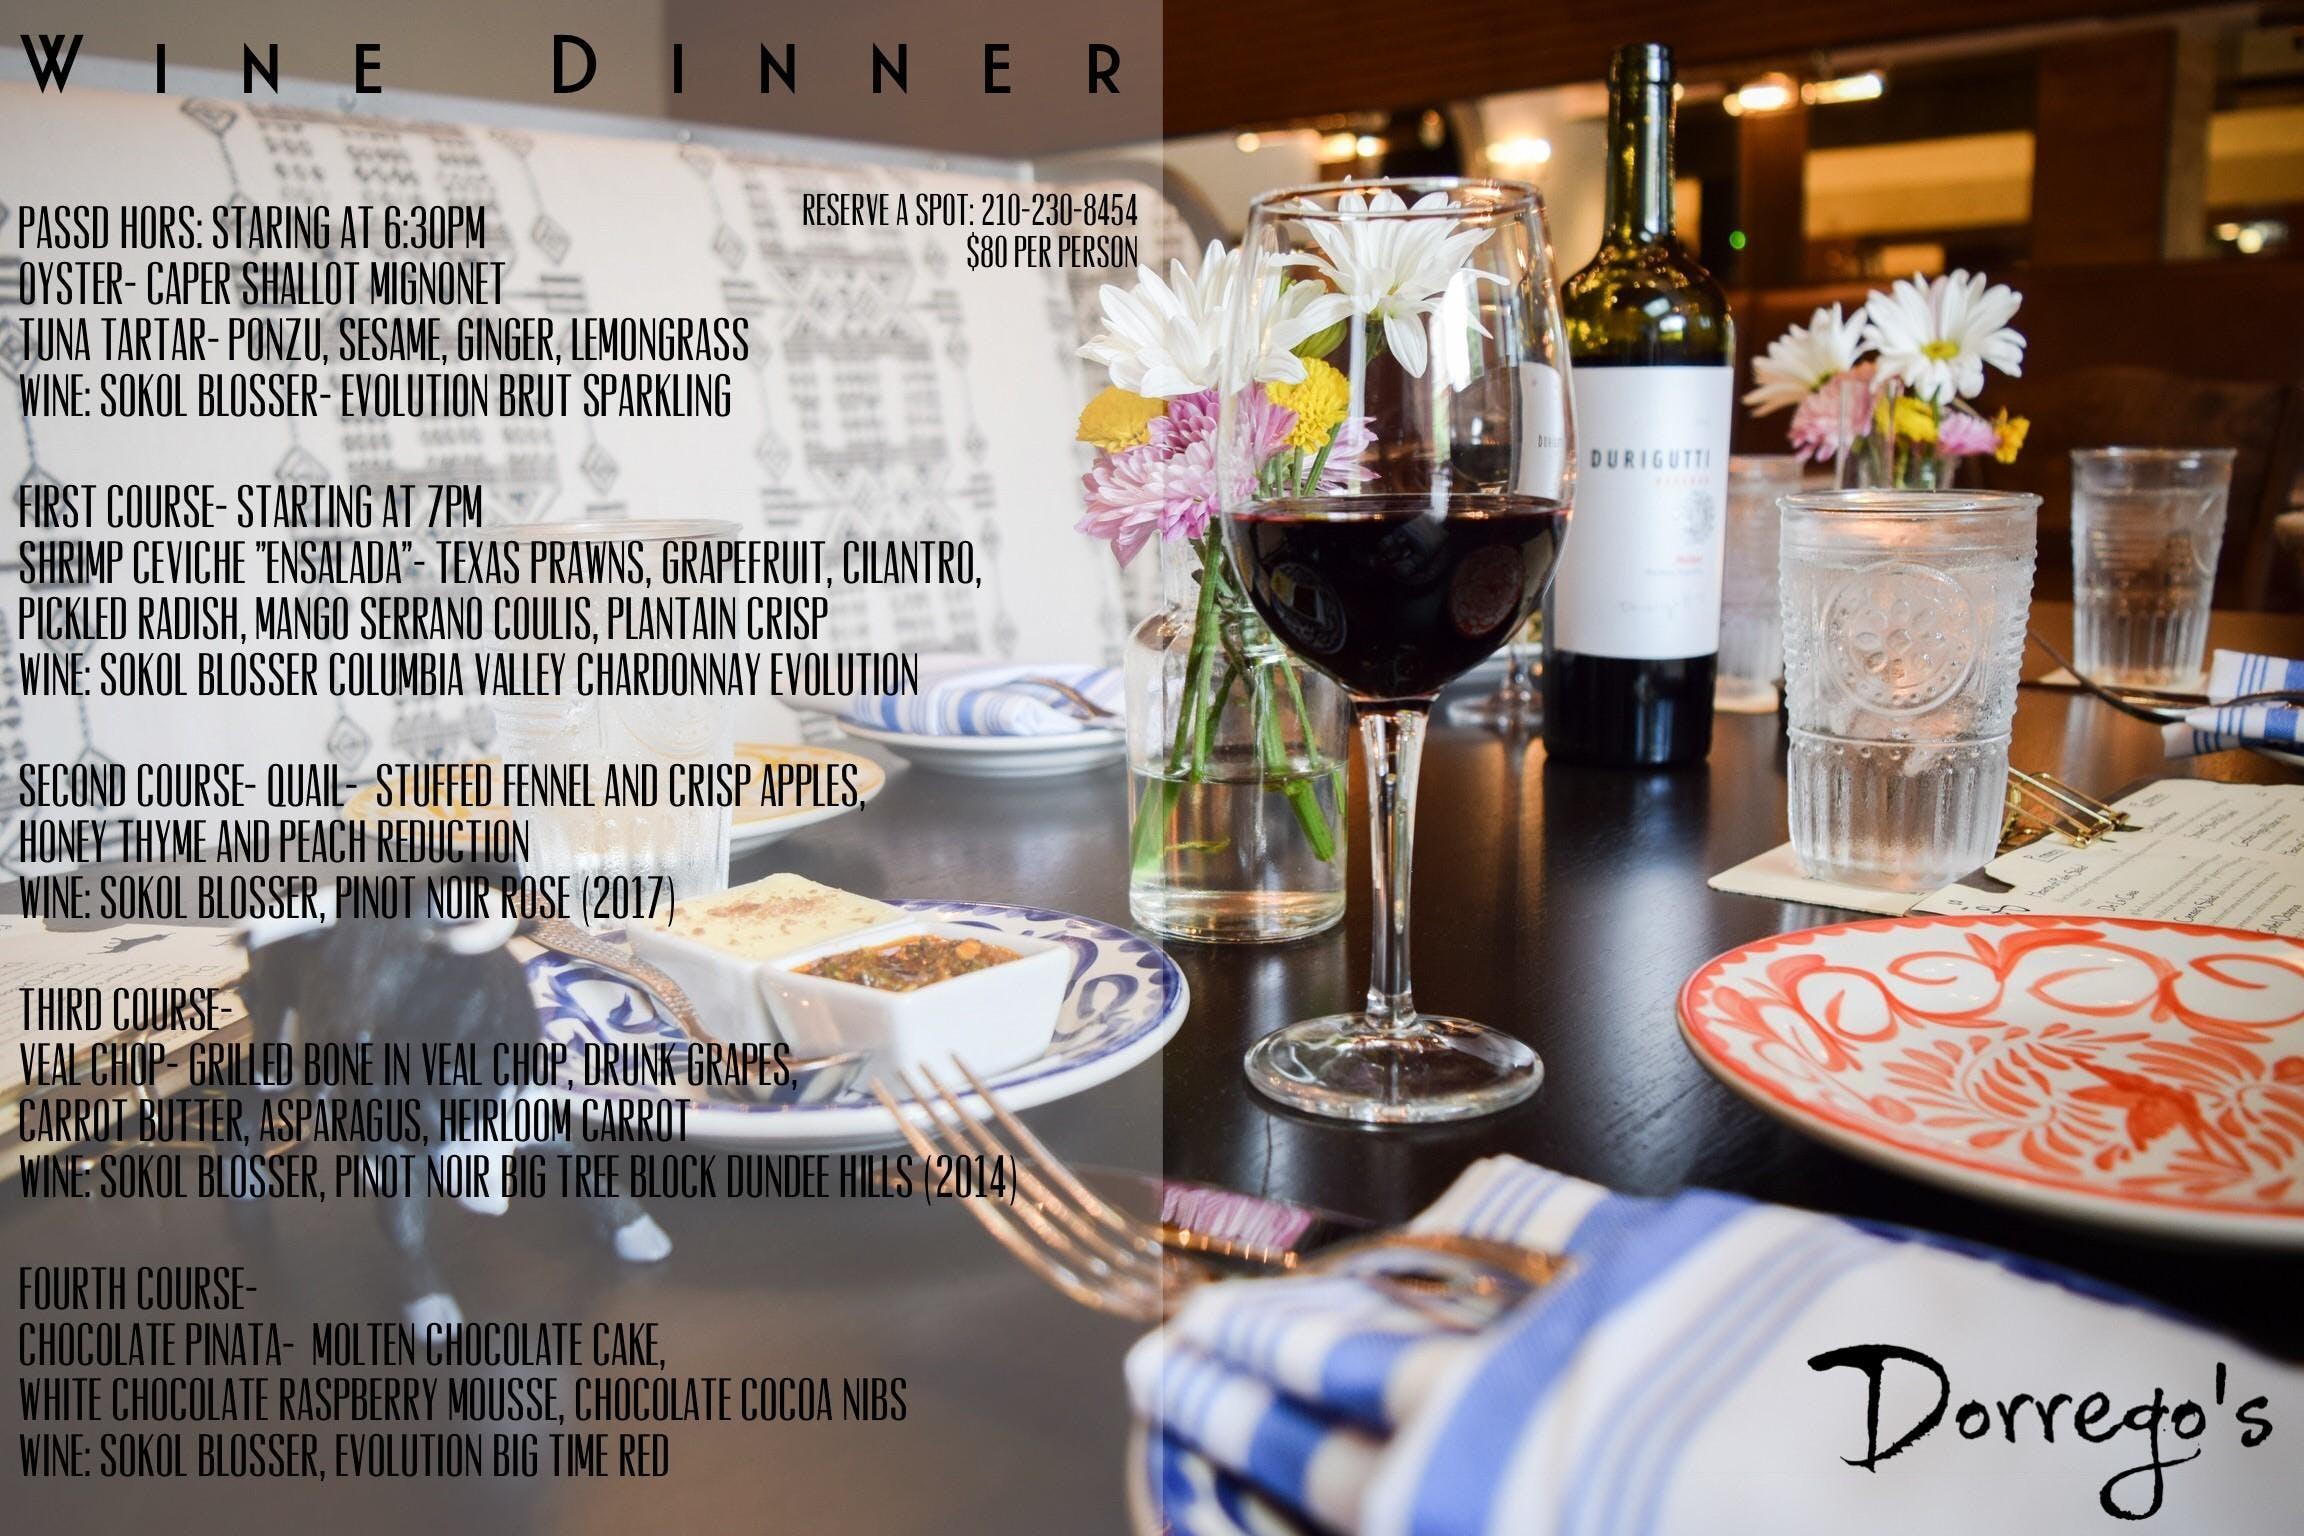 Argentine Wine Dinner - $80 per person